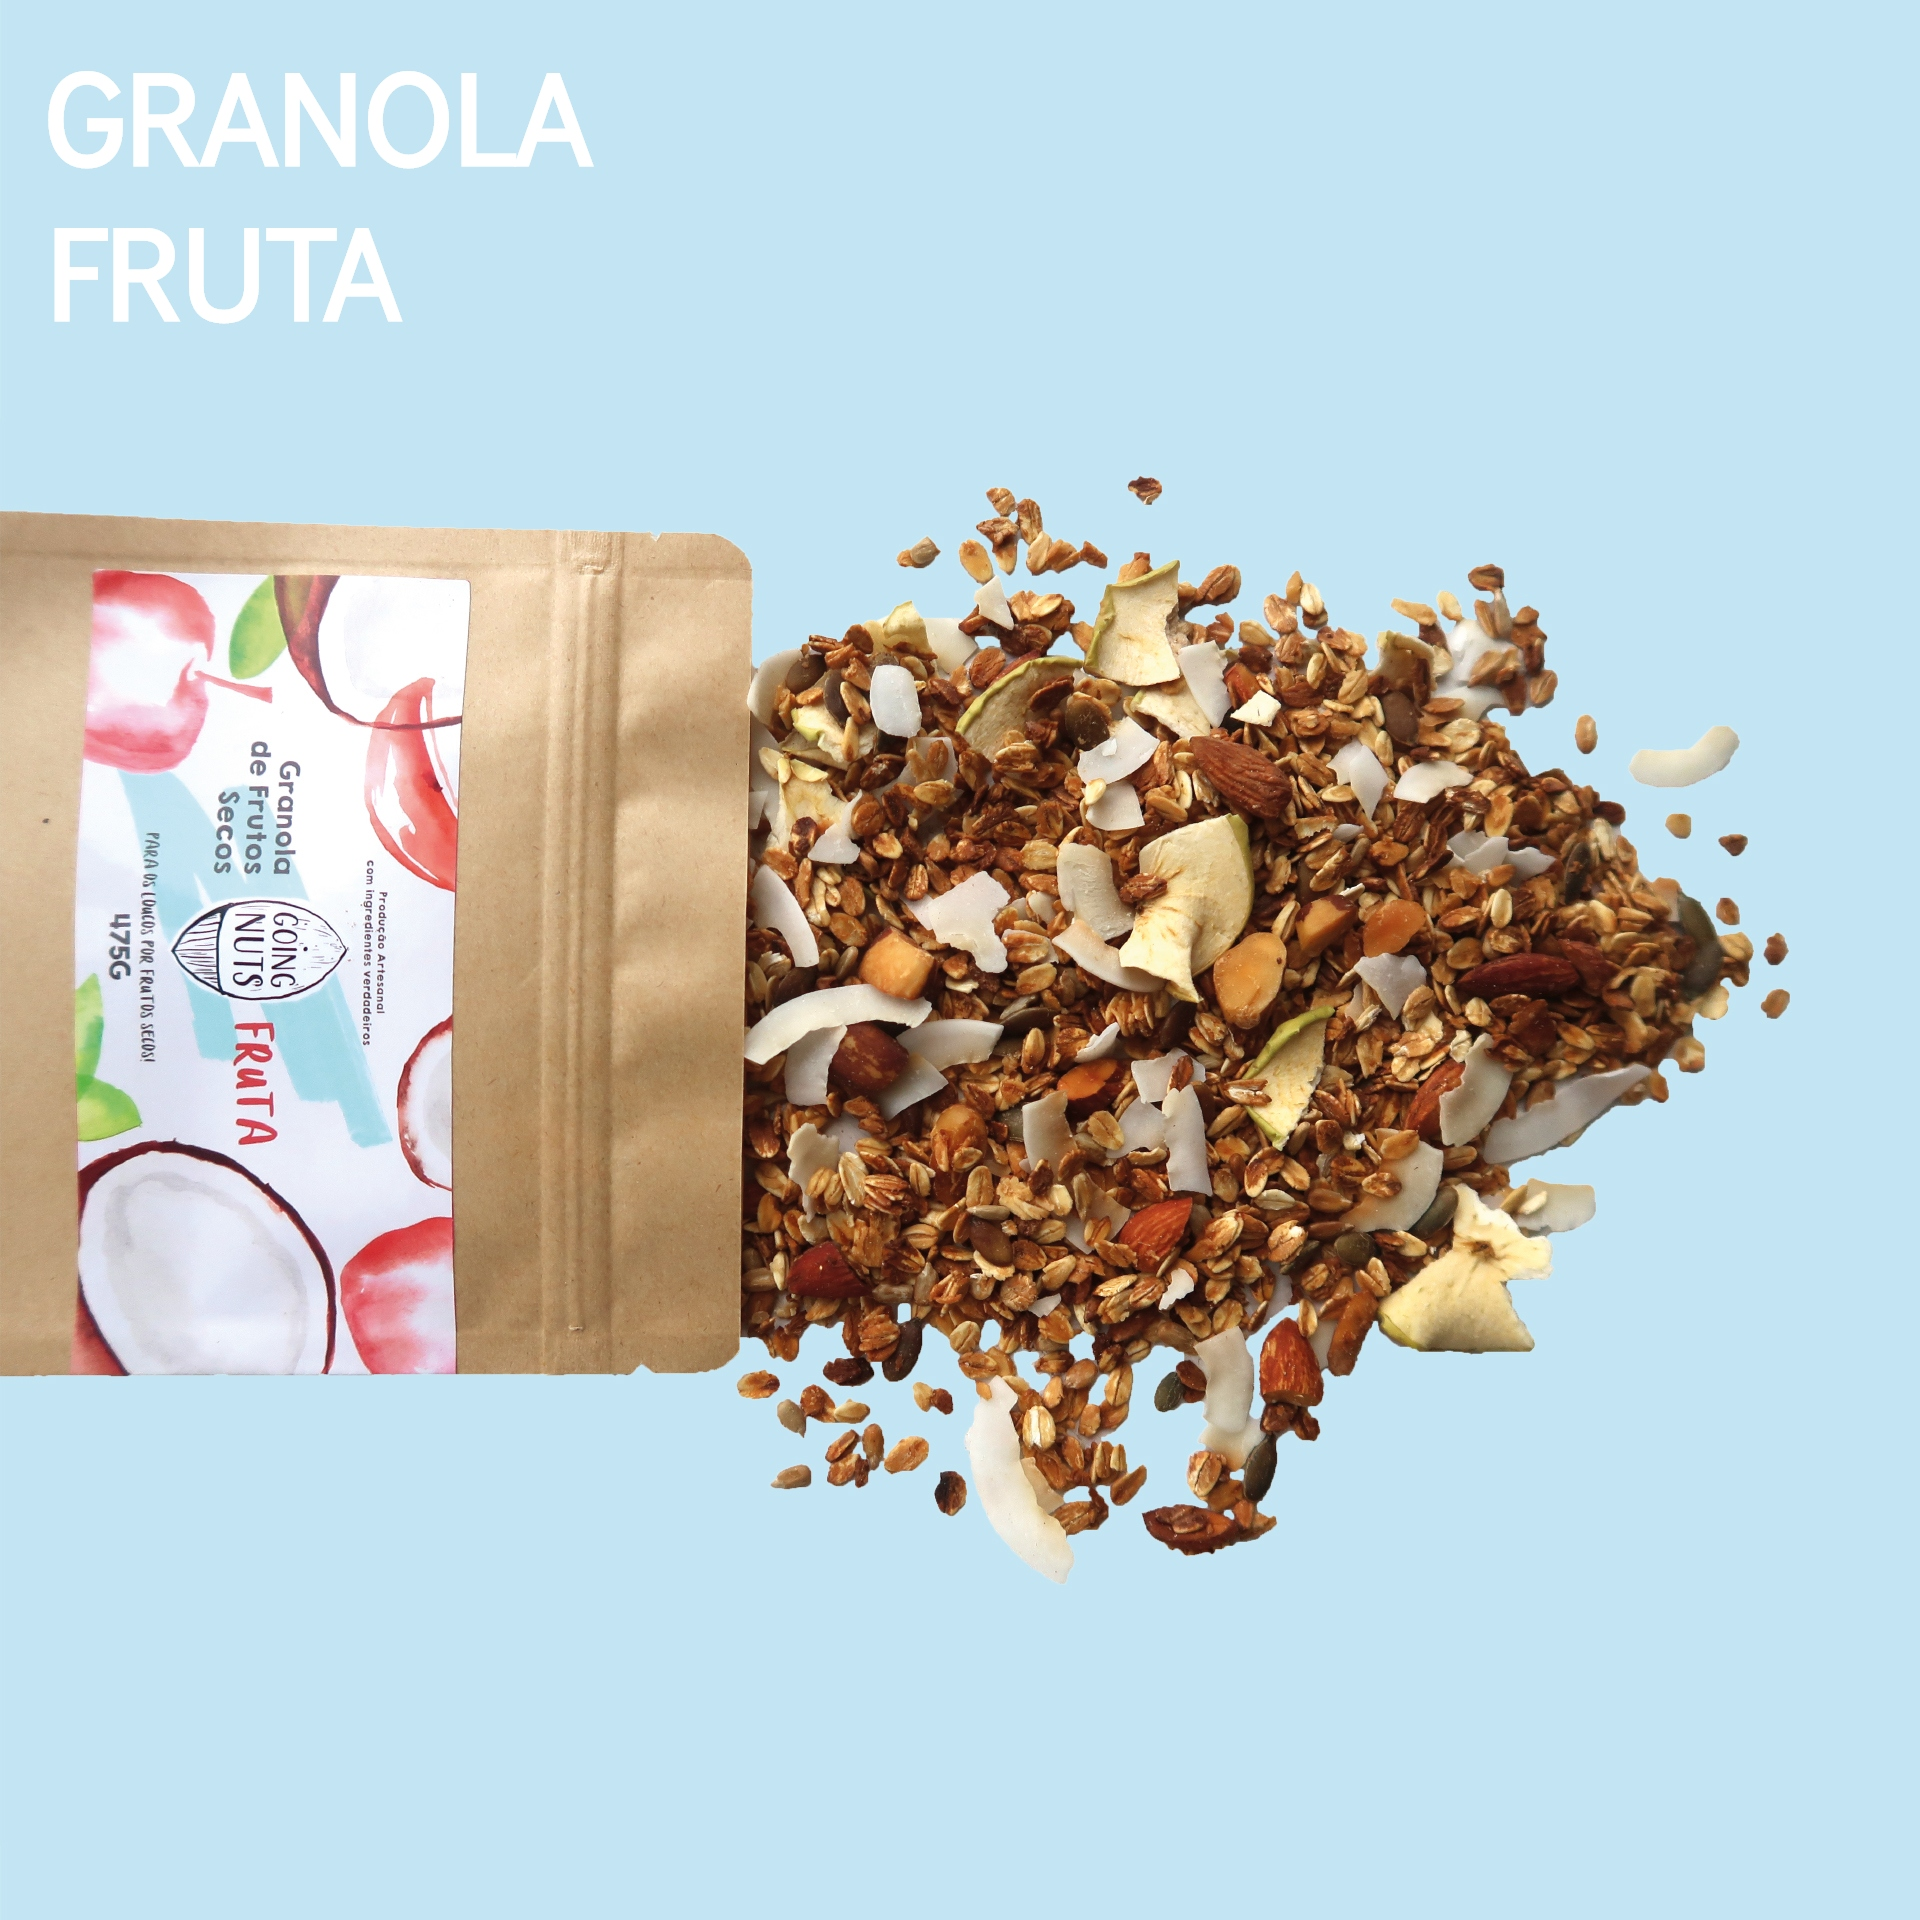 Granola Fruta | 475G